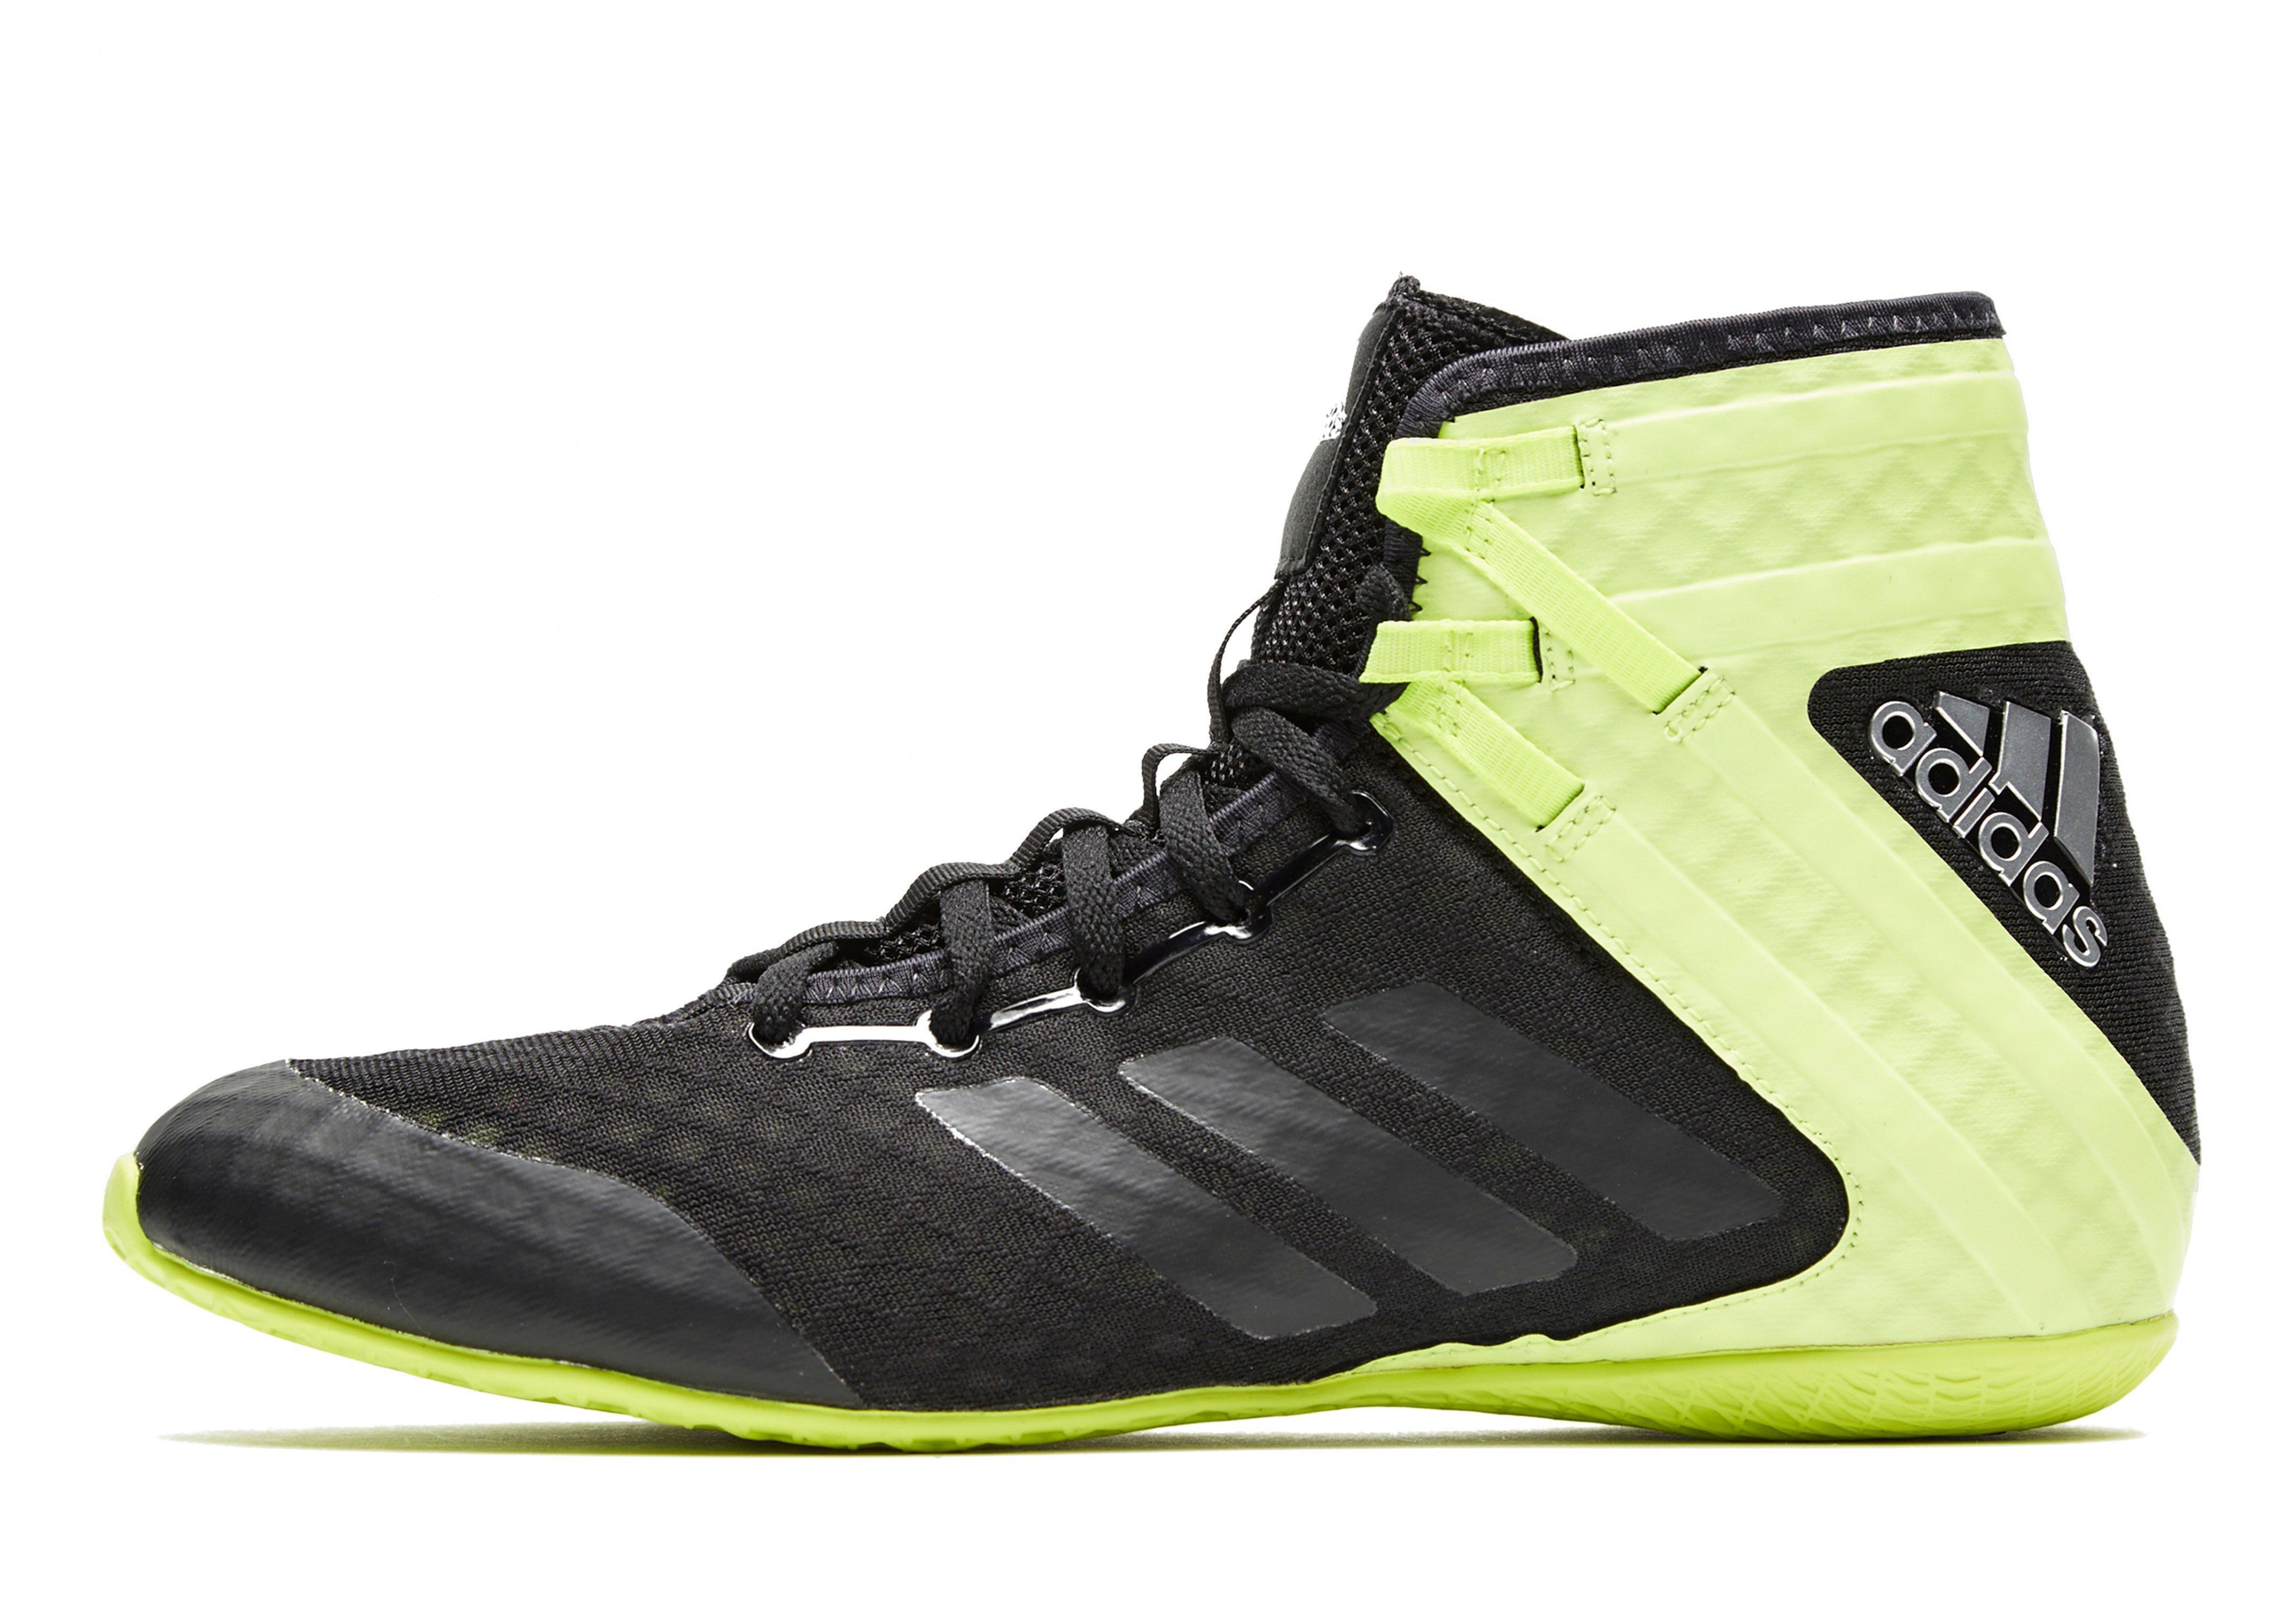 Lyst Adidas Adidas Lyst Speedex 16.1 Boxing Botas in Negro for Hombre 1834f8